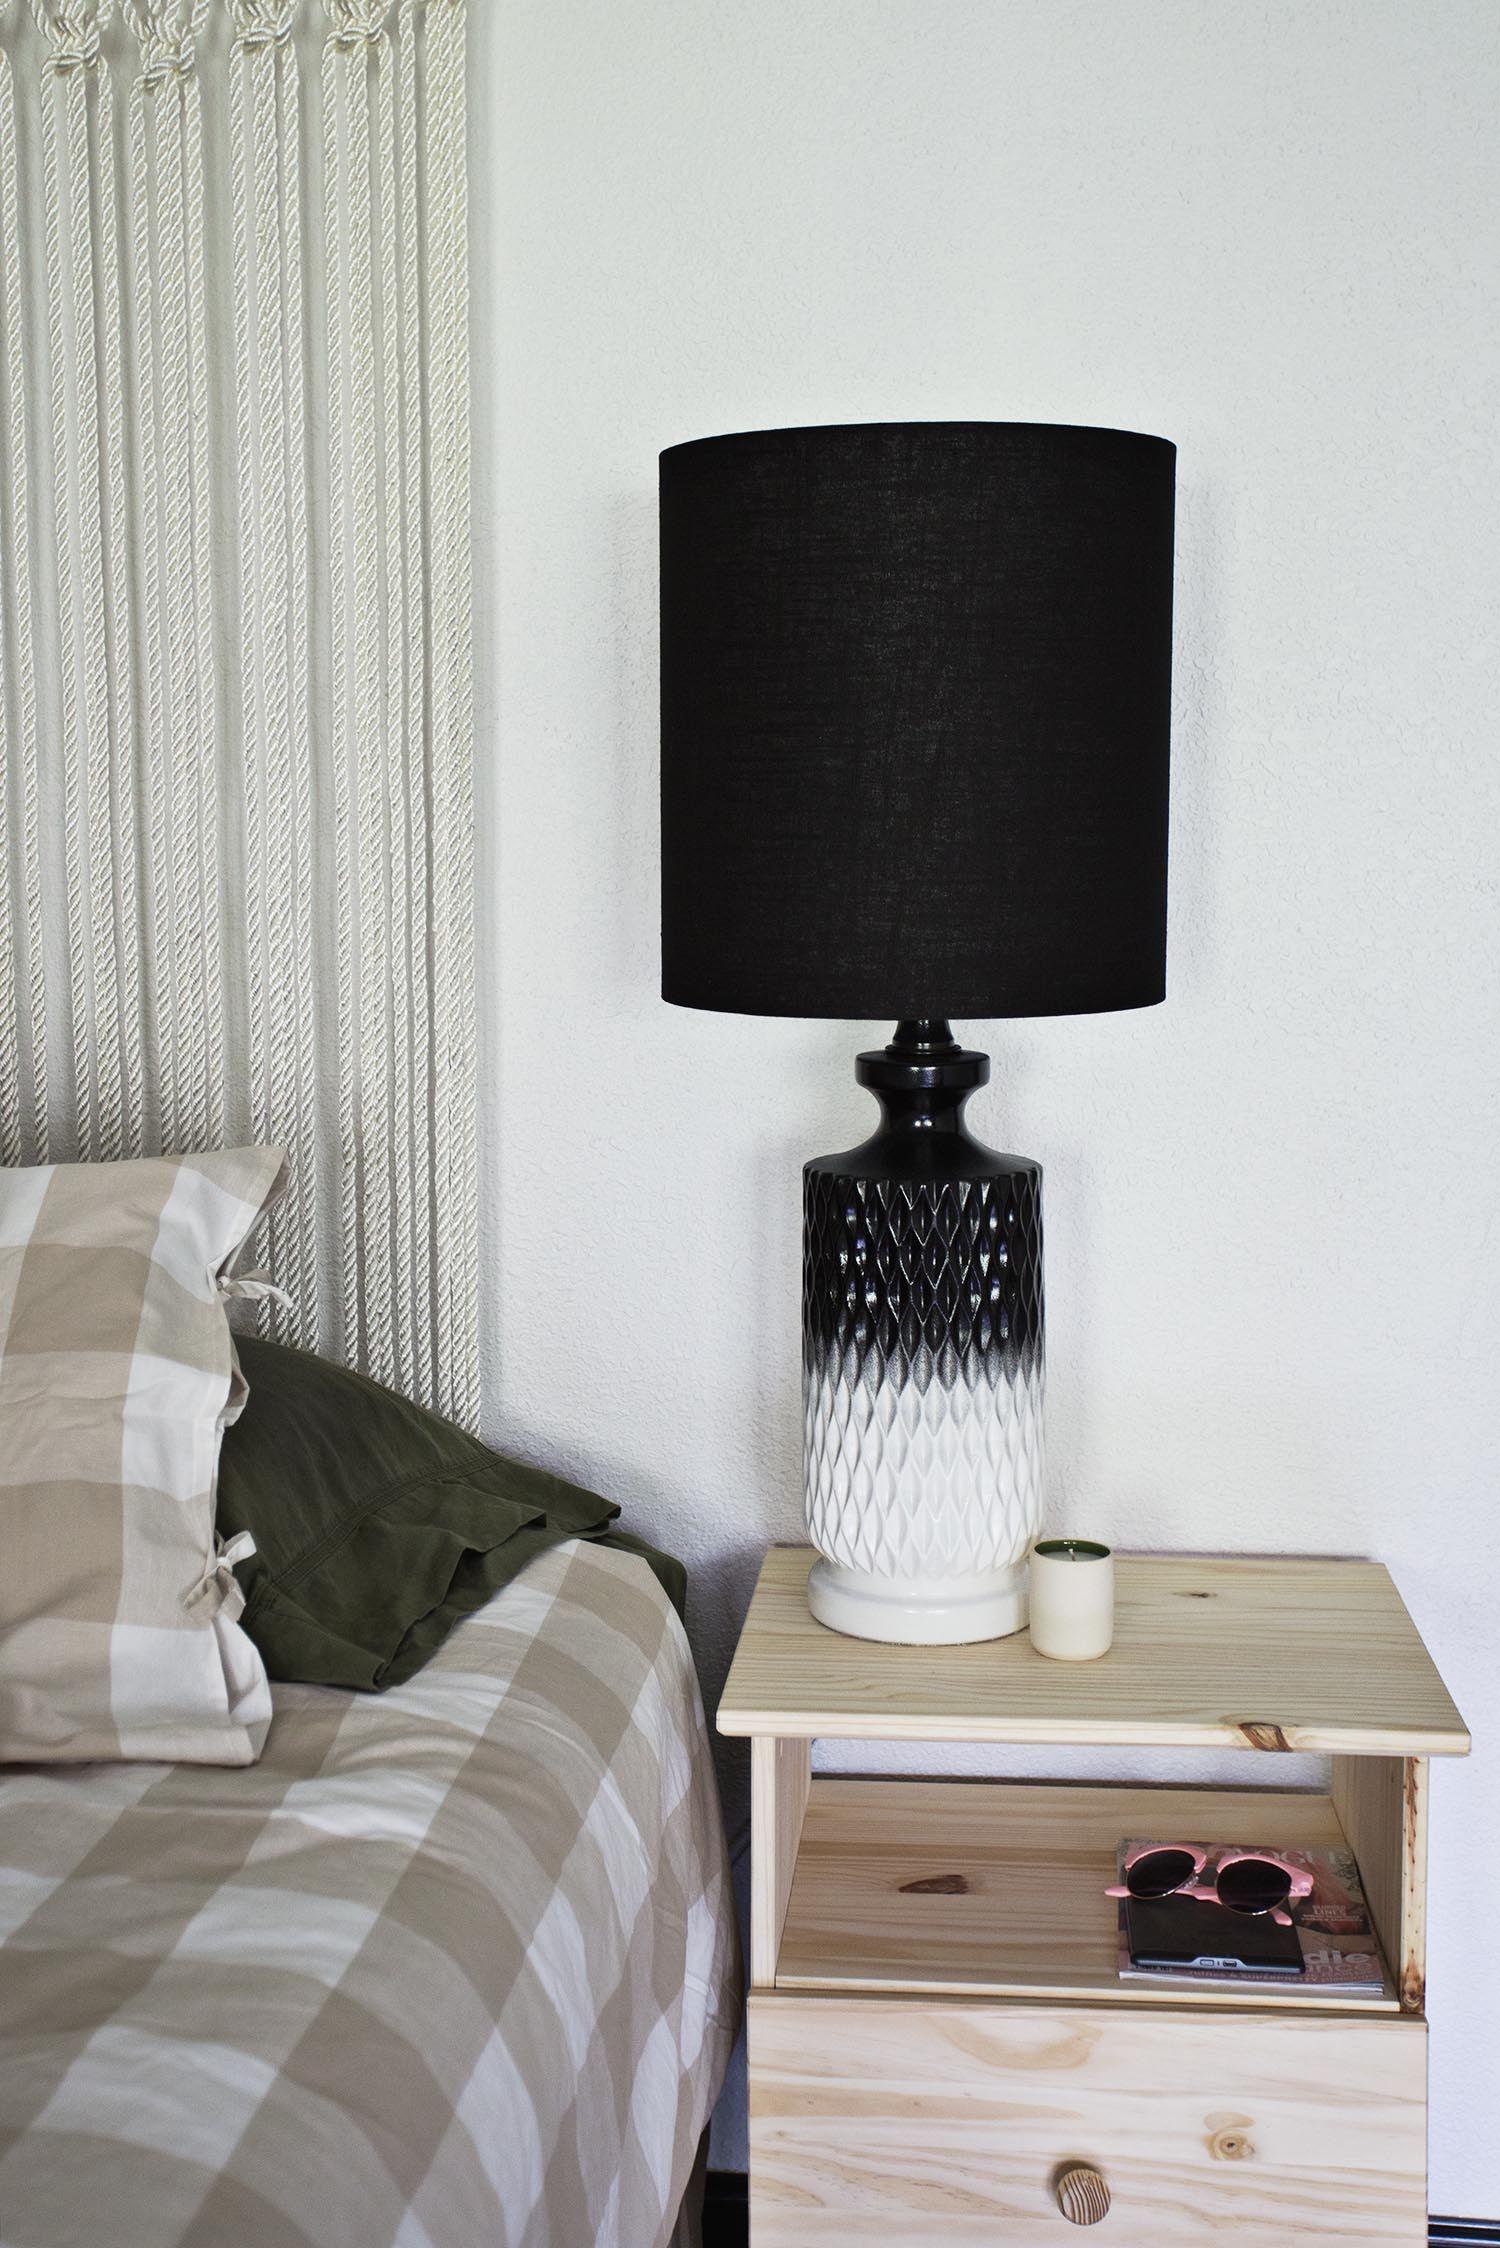 Project Restyle Bedside Lamps Lamp Makeover Bedside Lamp Decor